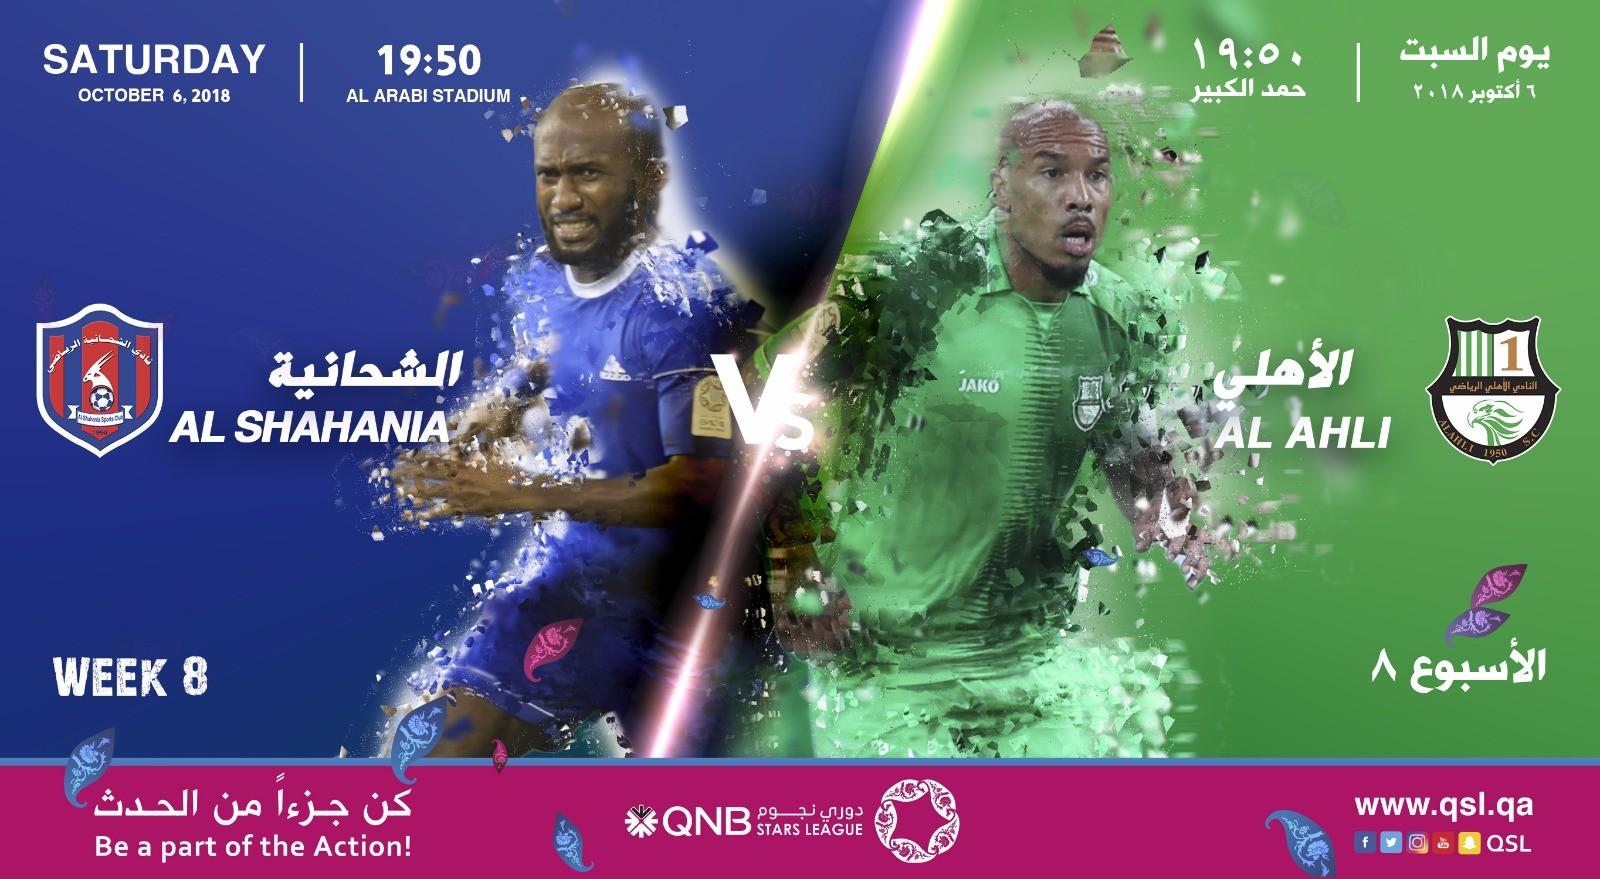 Al Shahania, Al Ahli look to make up for lost ground